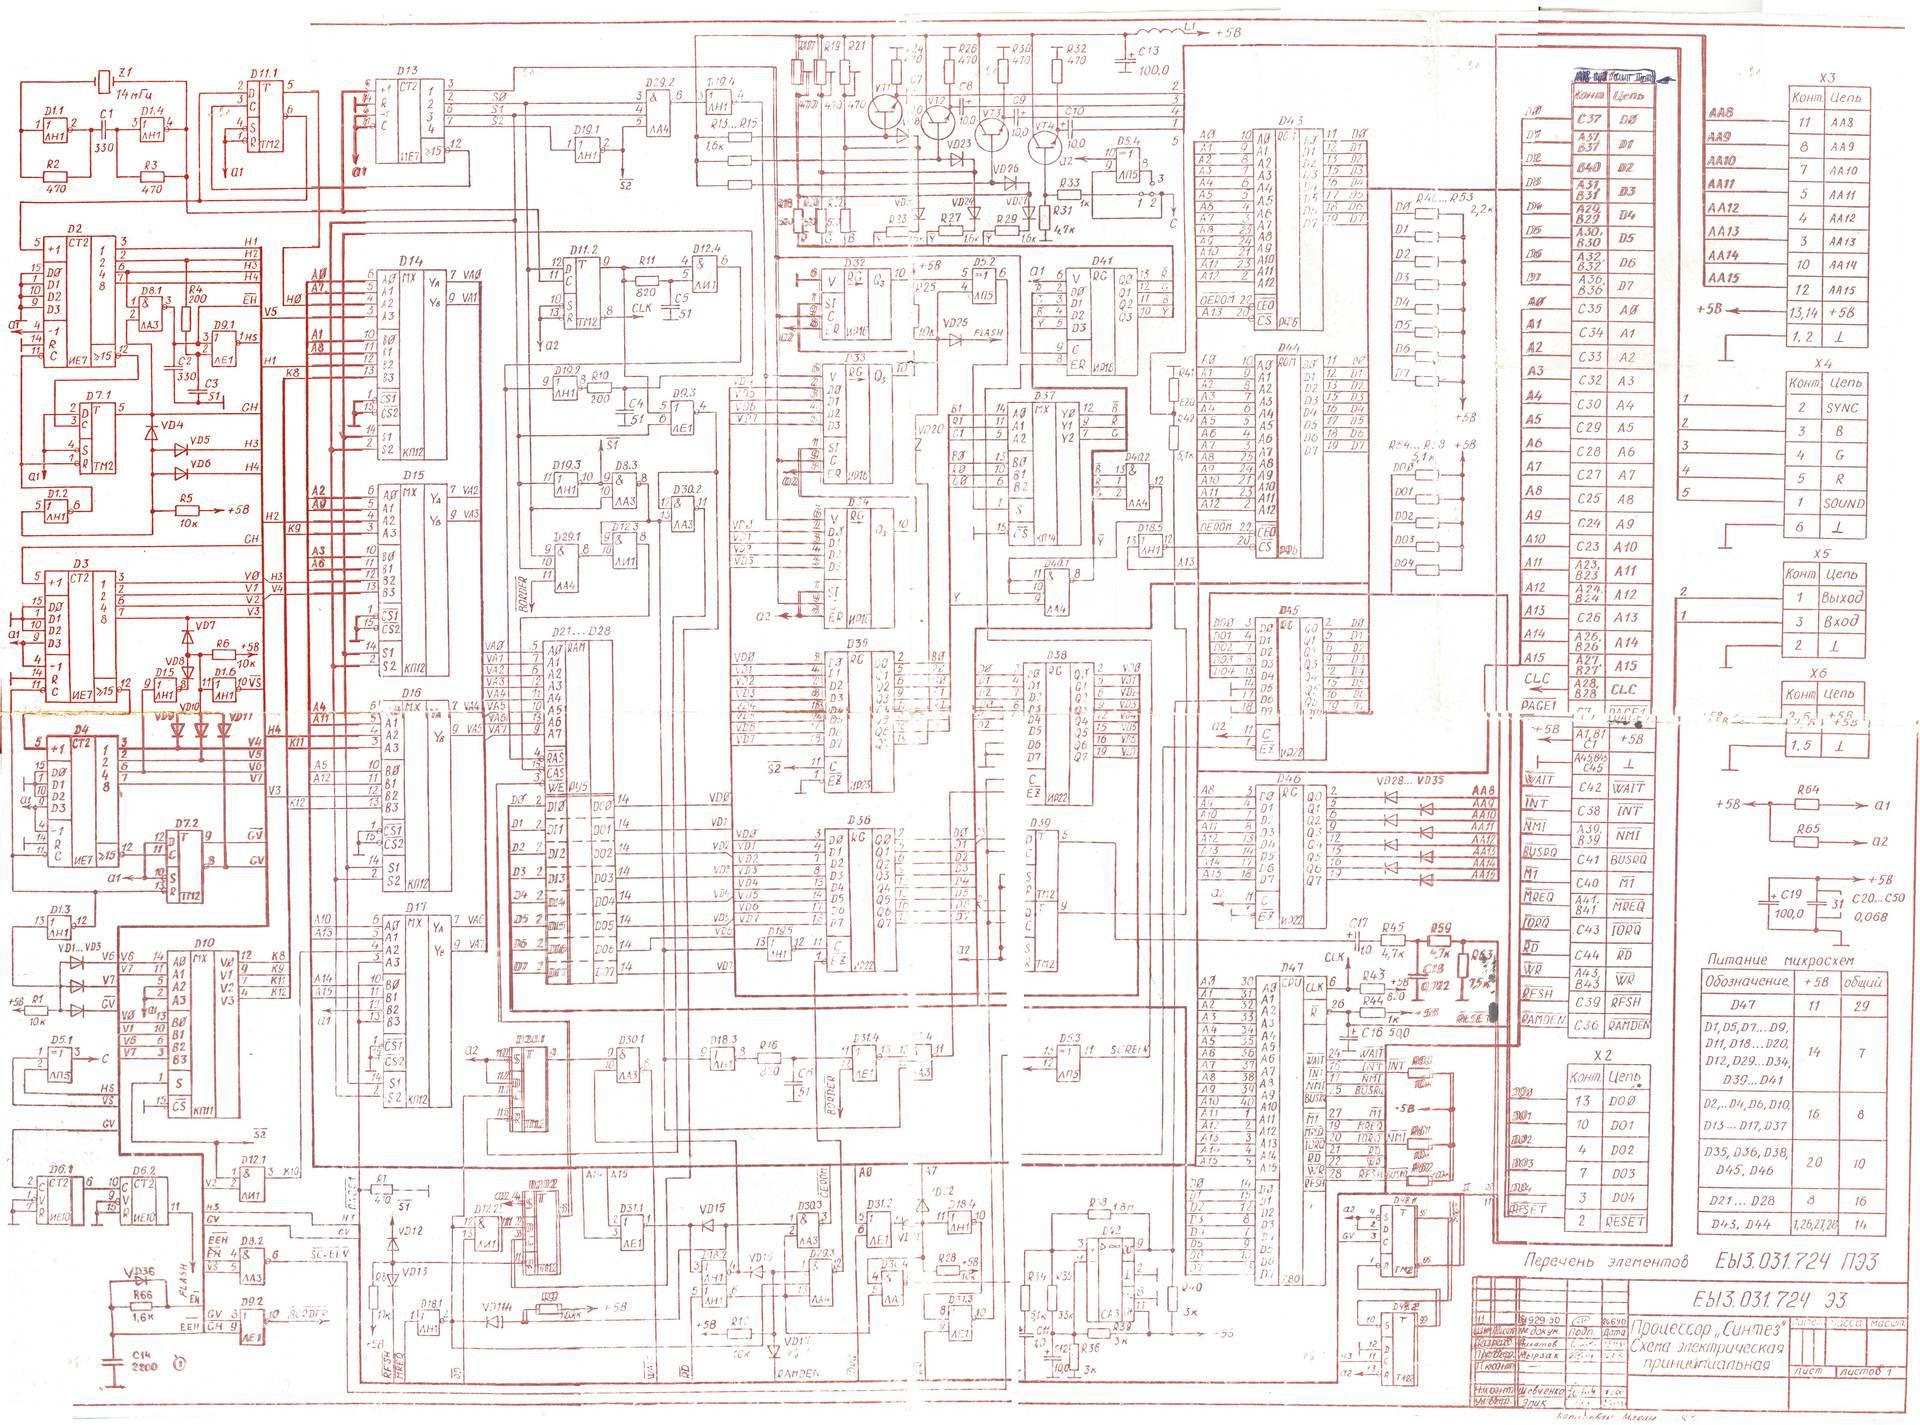 принципиальная схема бу-3с от телевизора